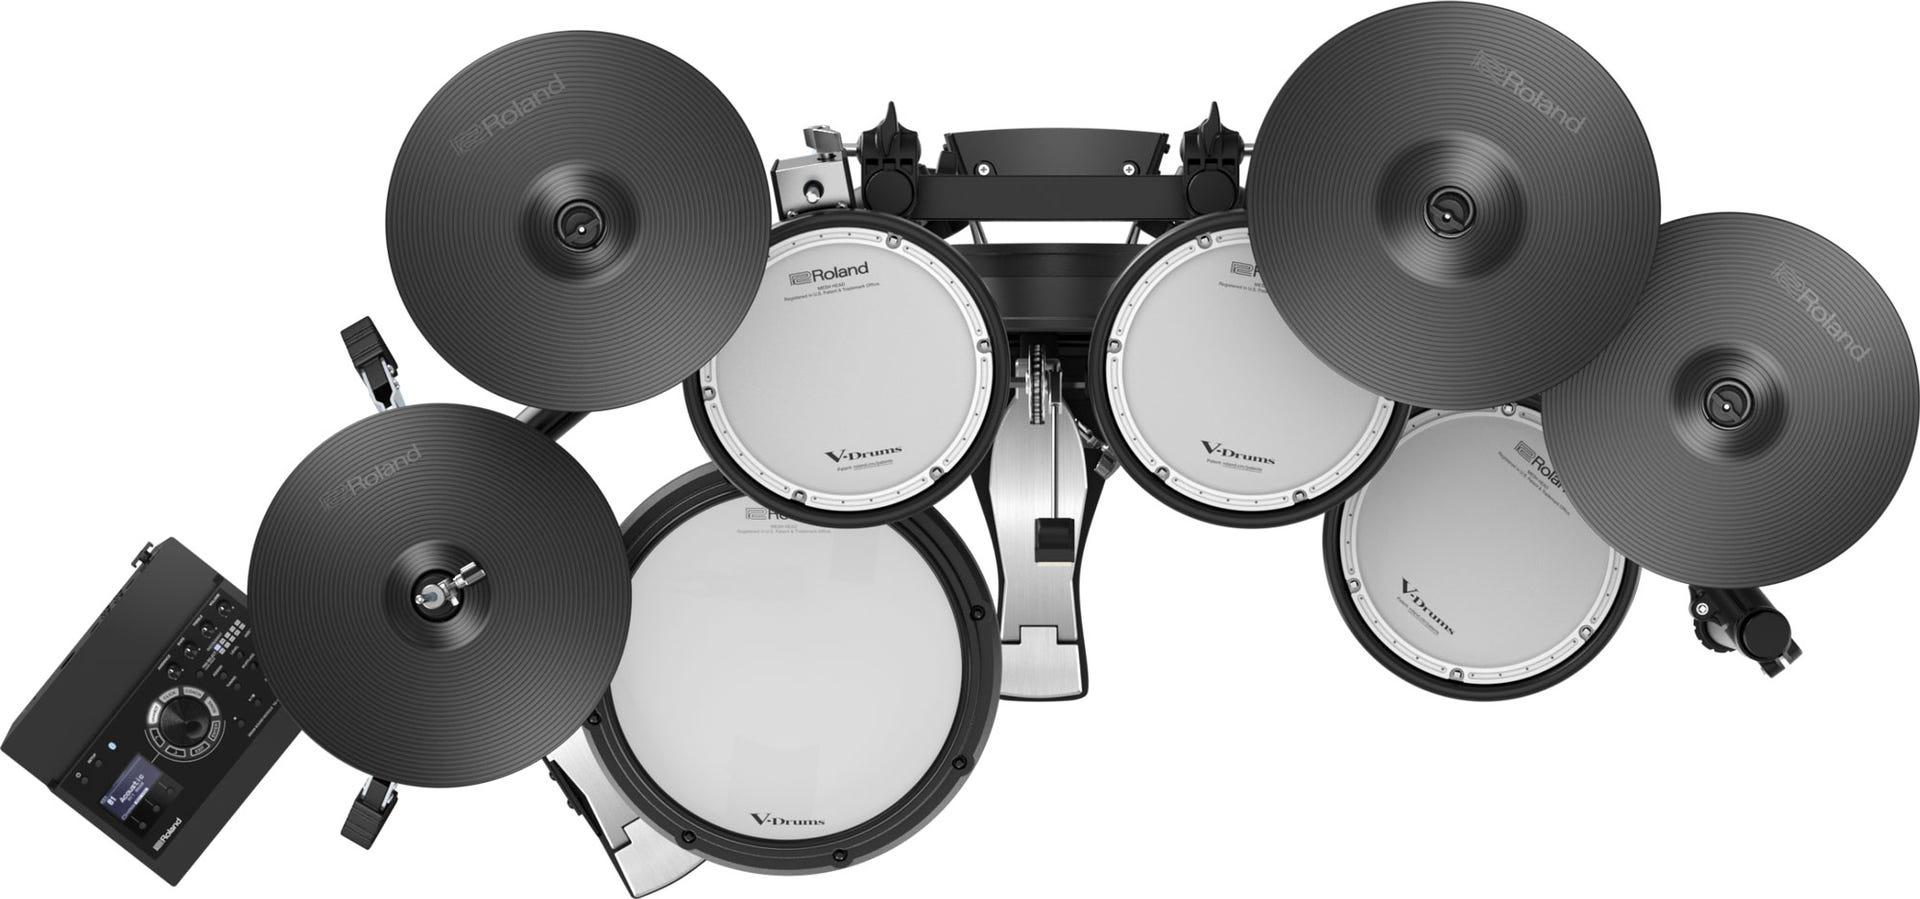 Roland V-Drums TD-17KVX Electronic Drum Kit w/Bluetooth (TD17KVXS)